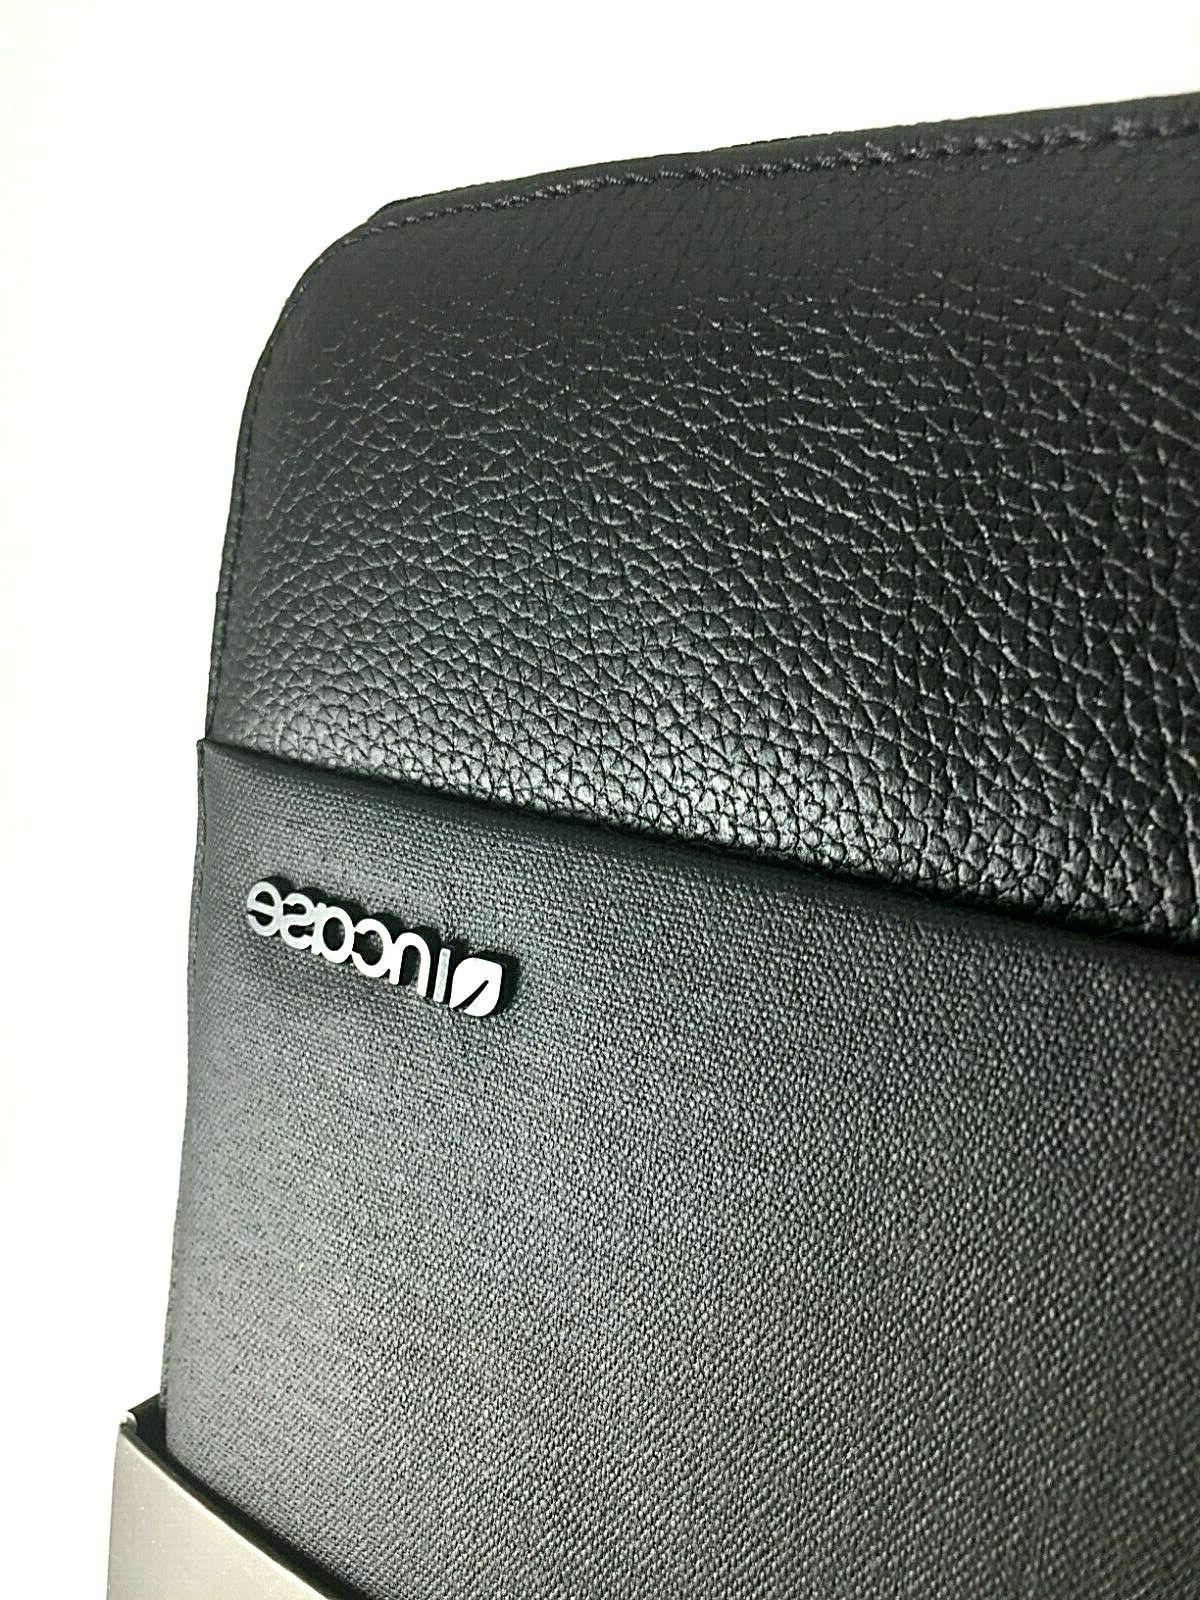 "BRAND-NEW 15"" Black Laptop For & More"